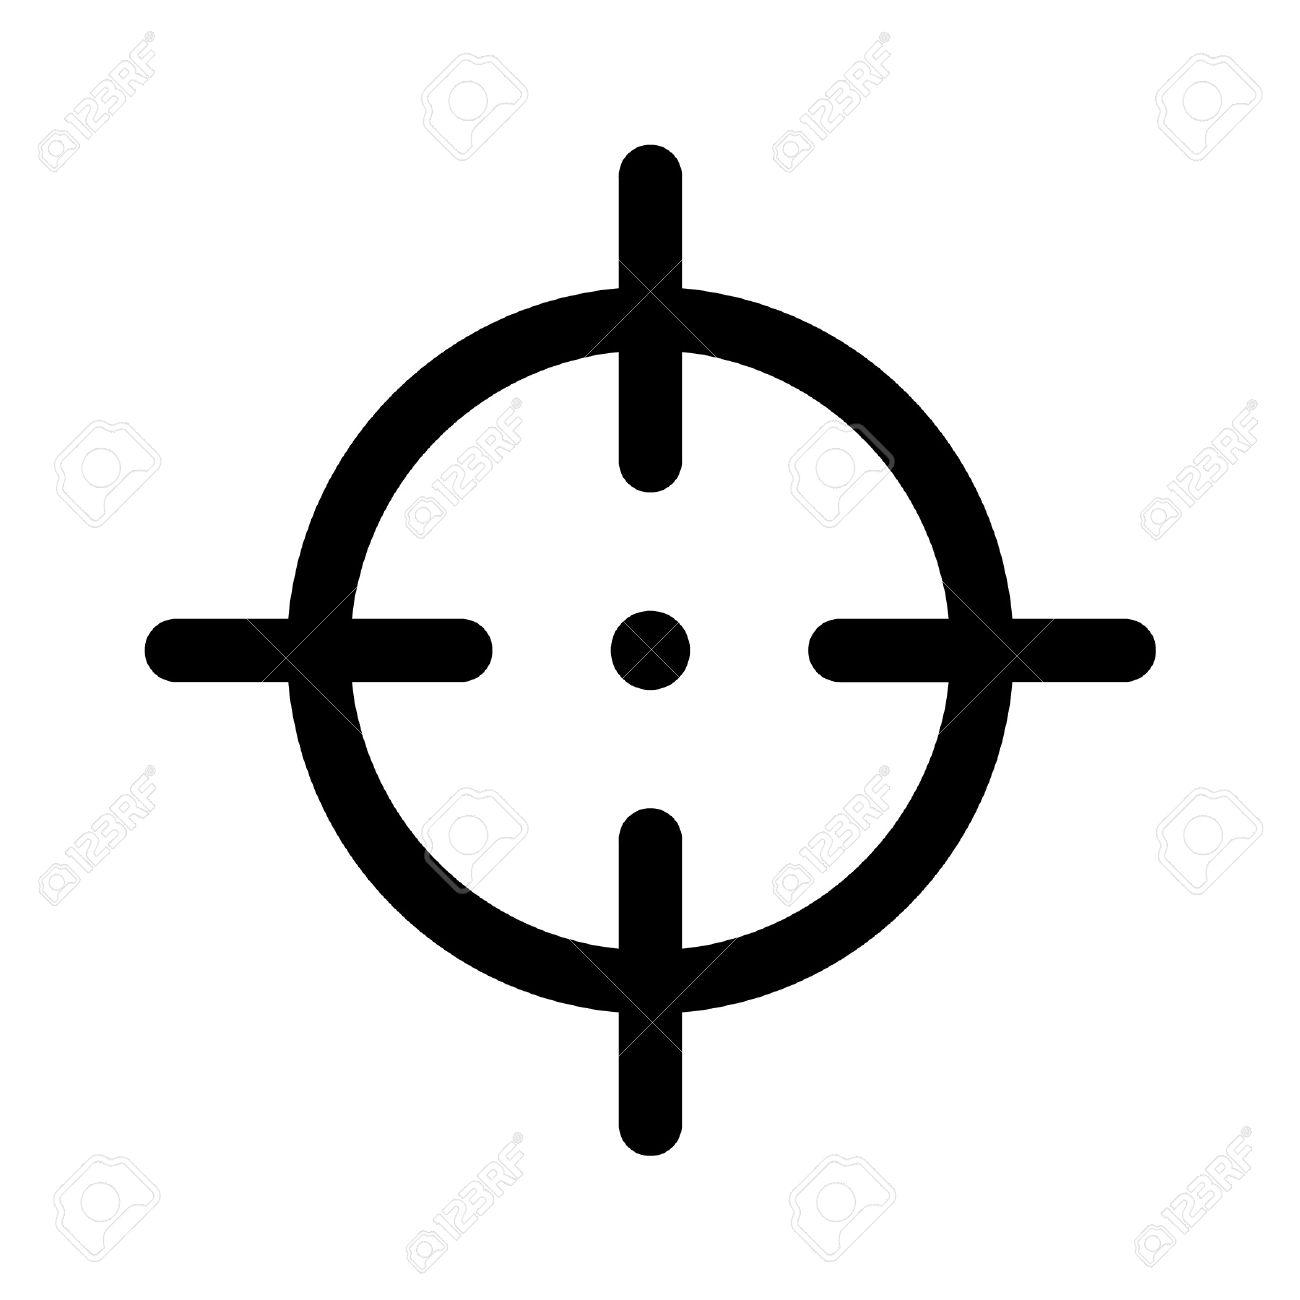 Target cross clipart svg free stock Crosshair Clipart | Free download best Crosshair Clipart on ... svg free stock